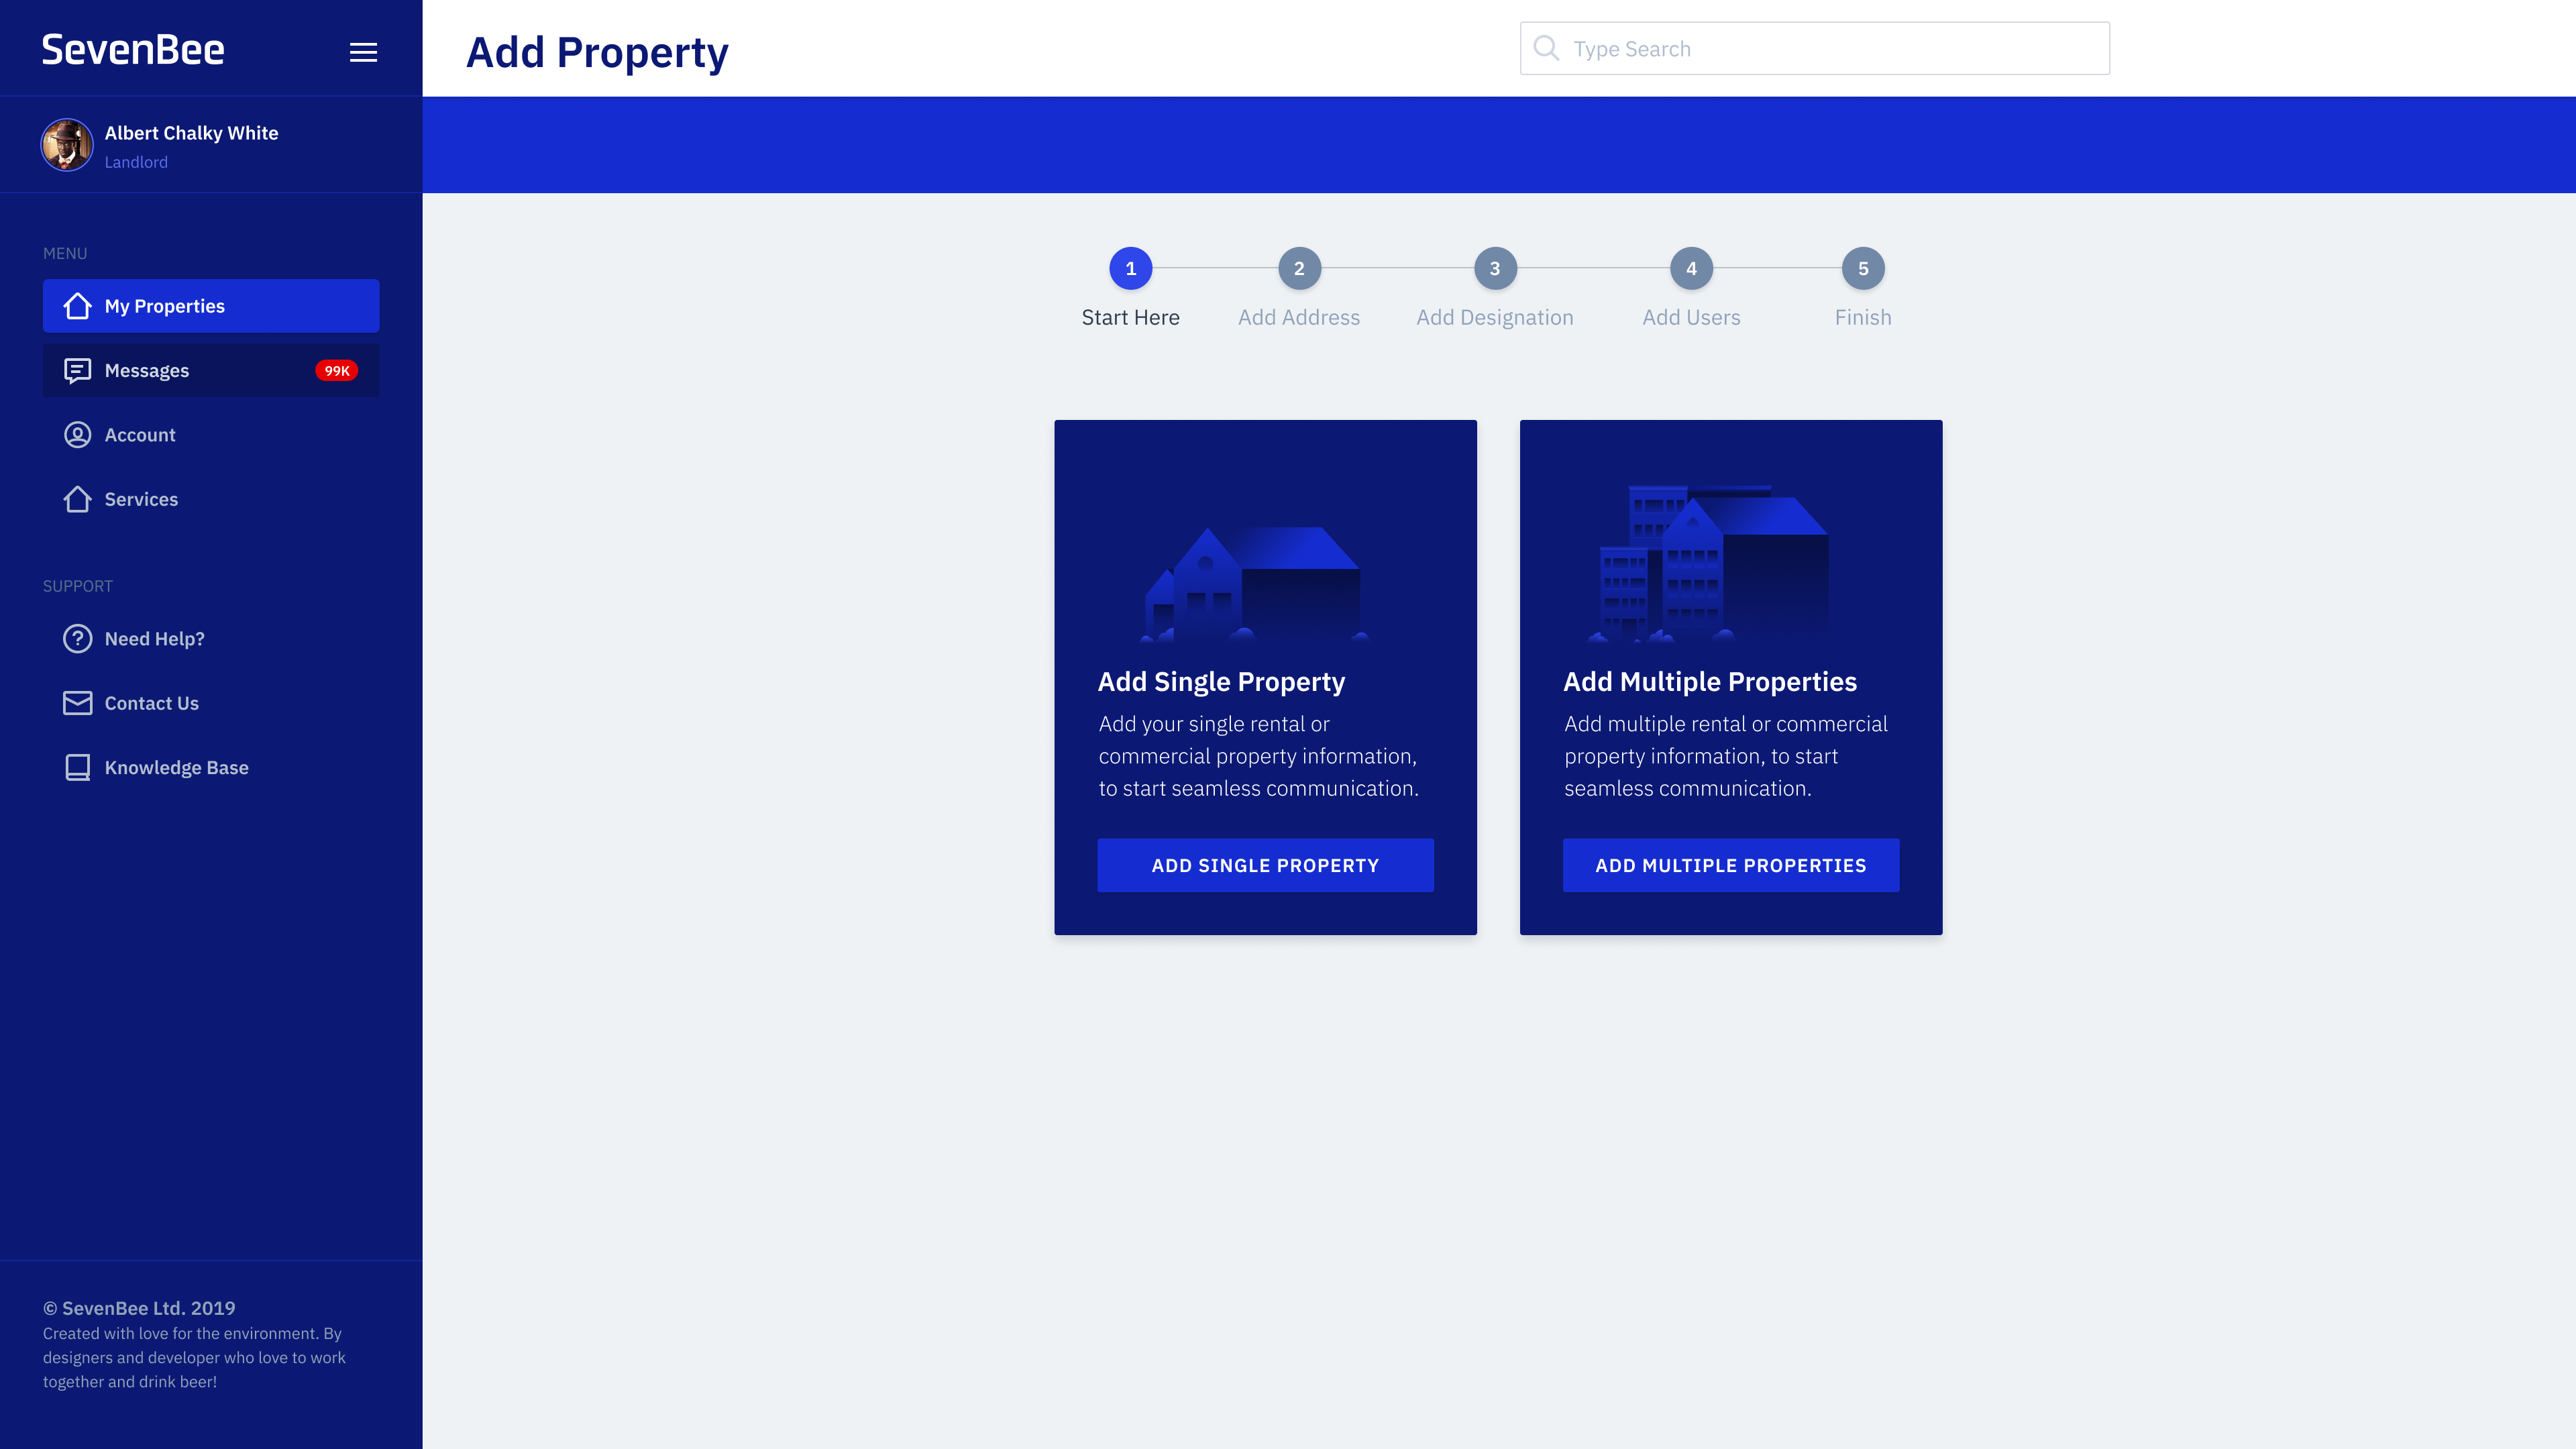 Add-Property